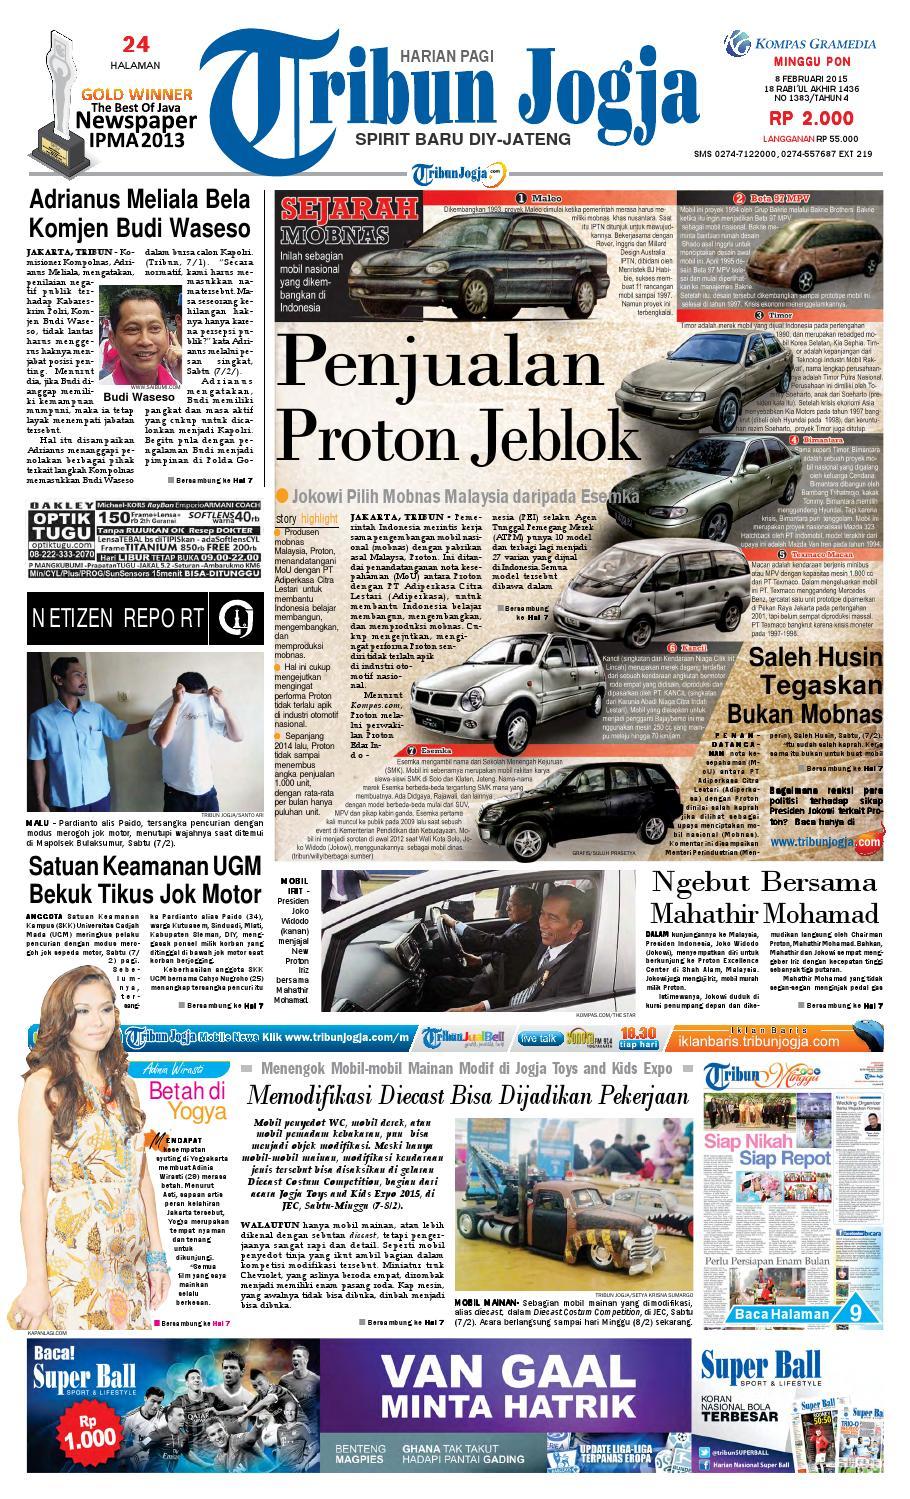 Tribunjogja 08 02 2015 By Tribun Jogja Issuu Produk Ukm Bumn Sambal Bawang Goreng Maklin